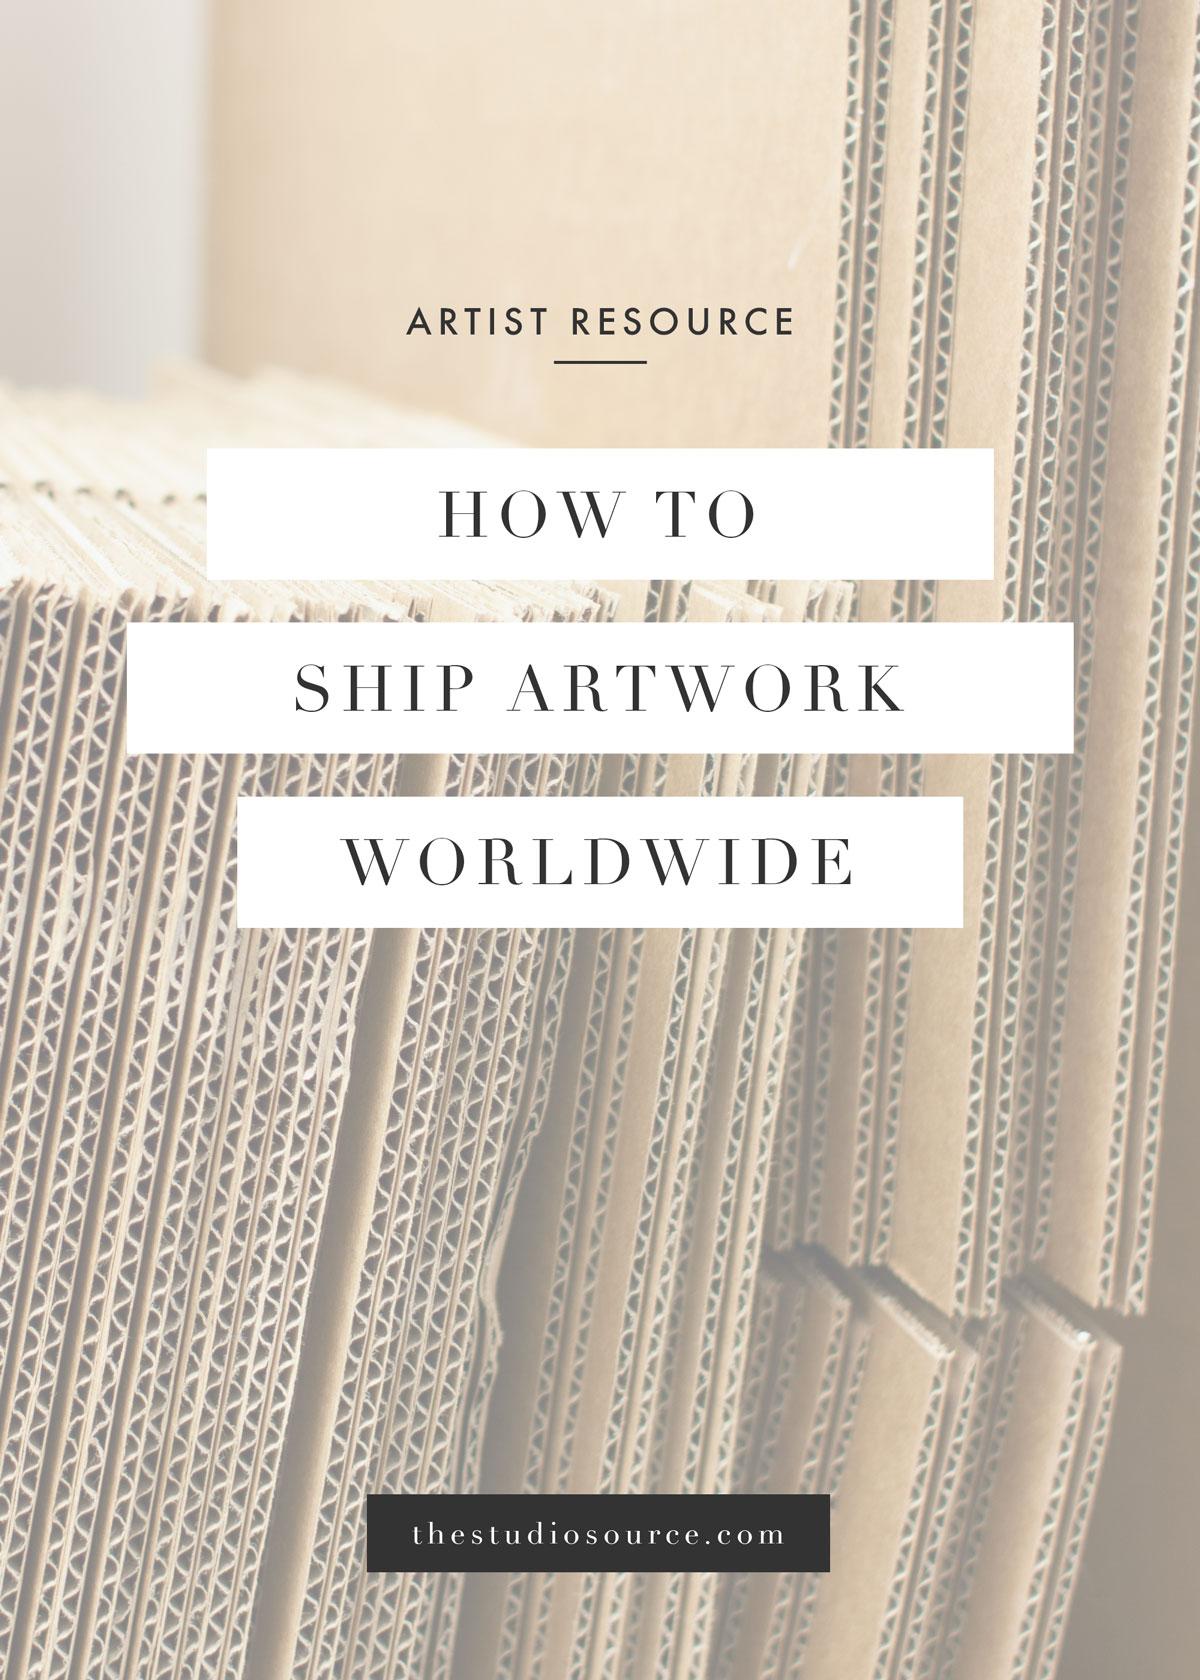 TSS-artist-resource-how-to-ship-artwork-worldwide-blog-post.jpg